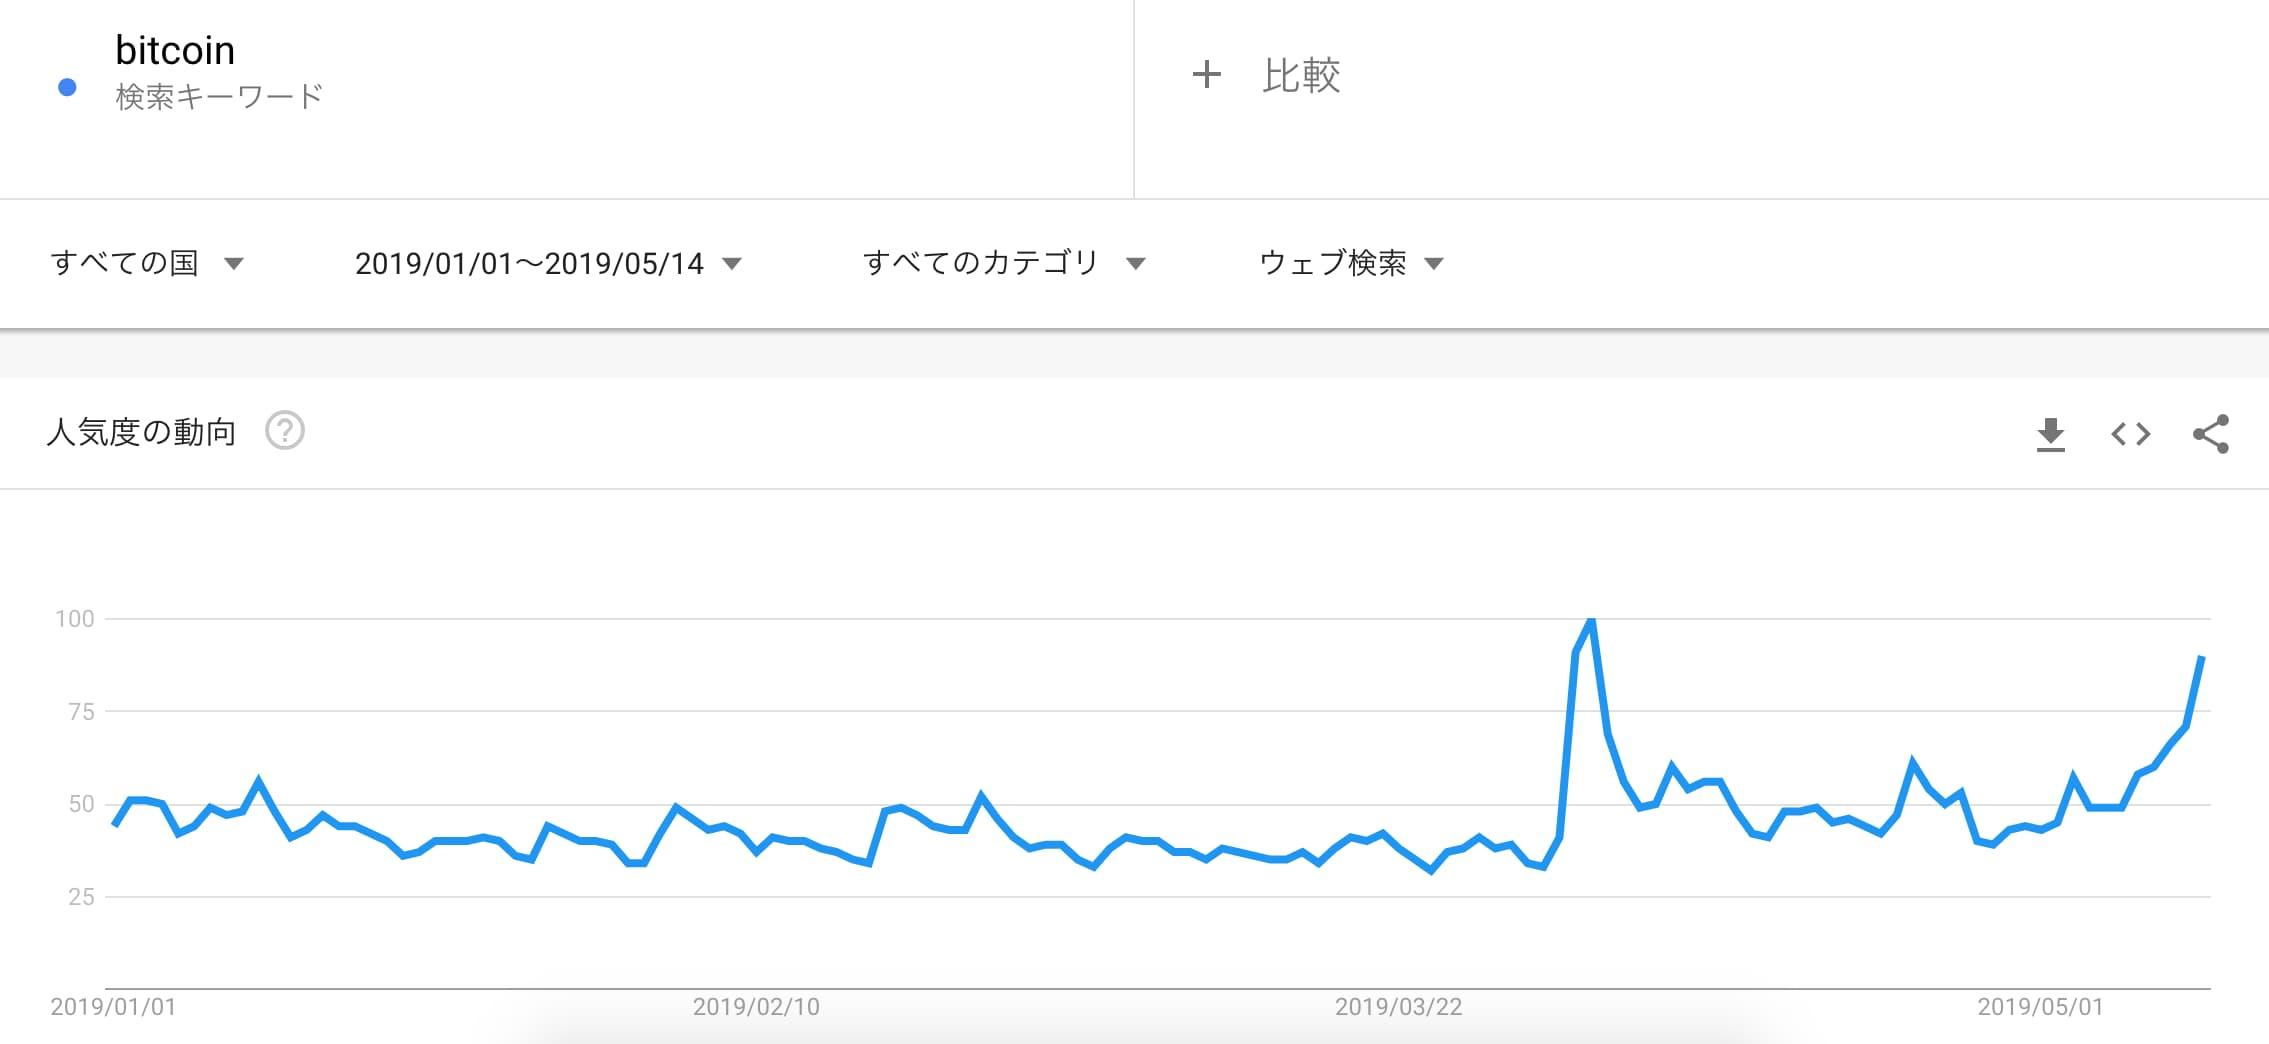 btcoin trend